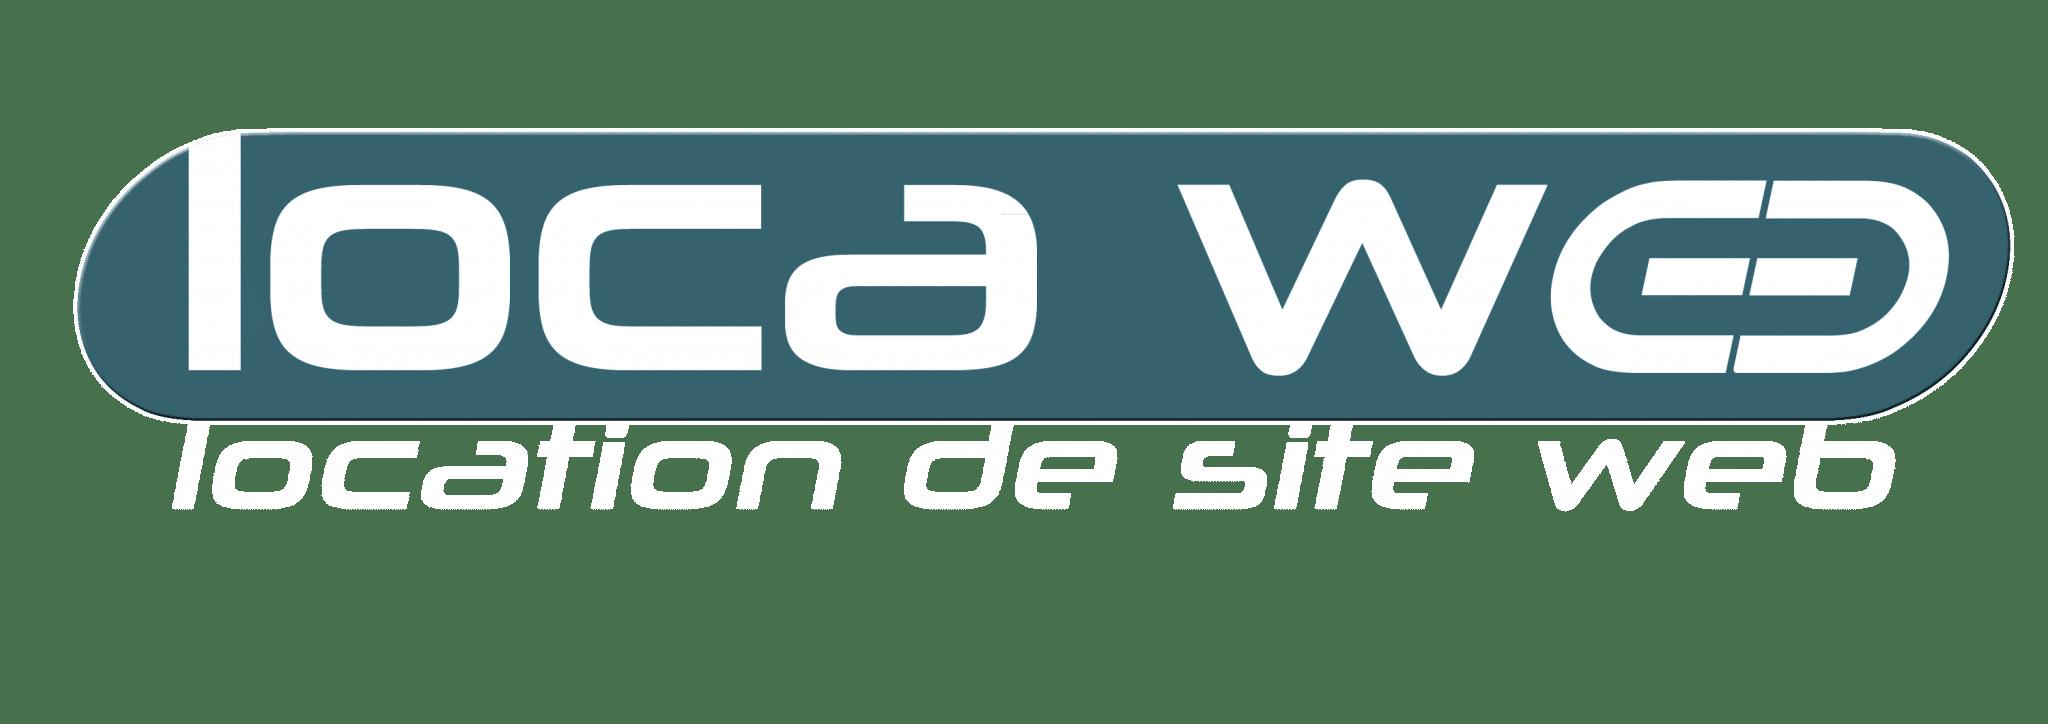 logo LOCAWEB